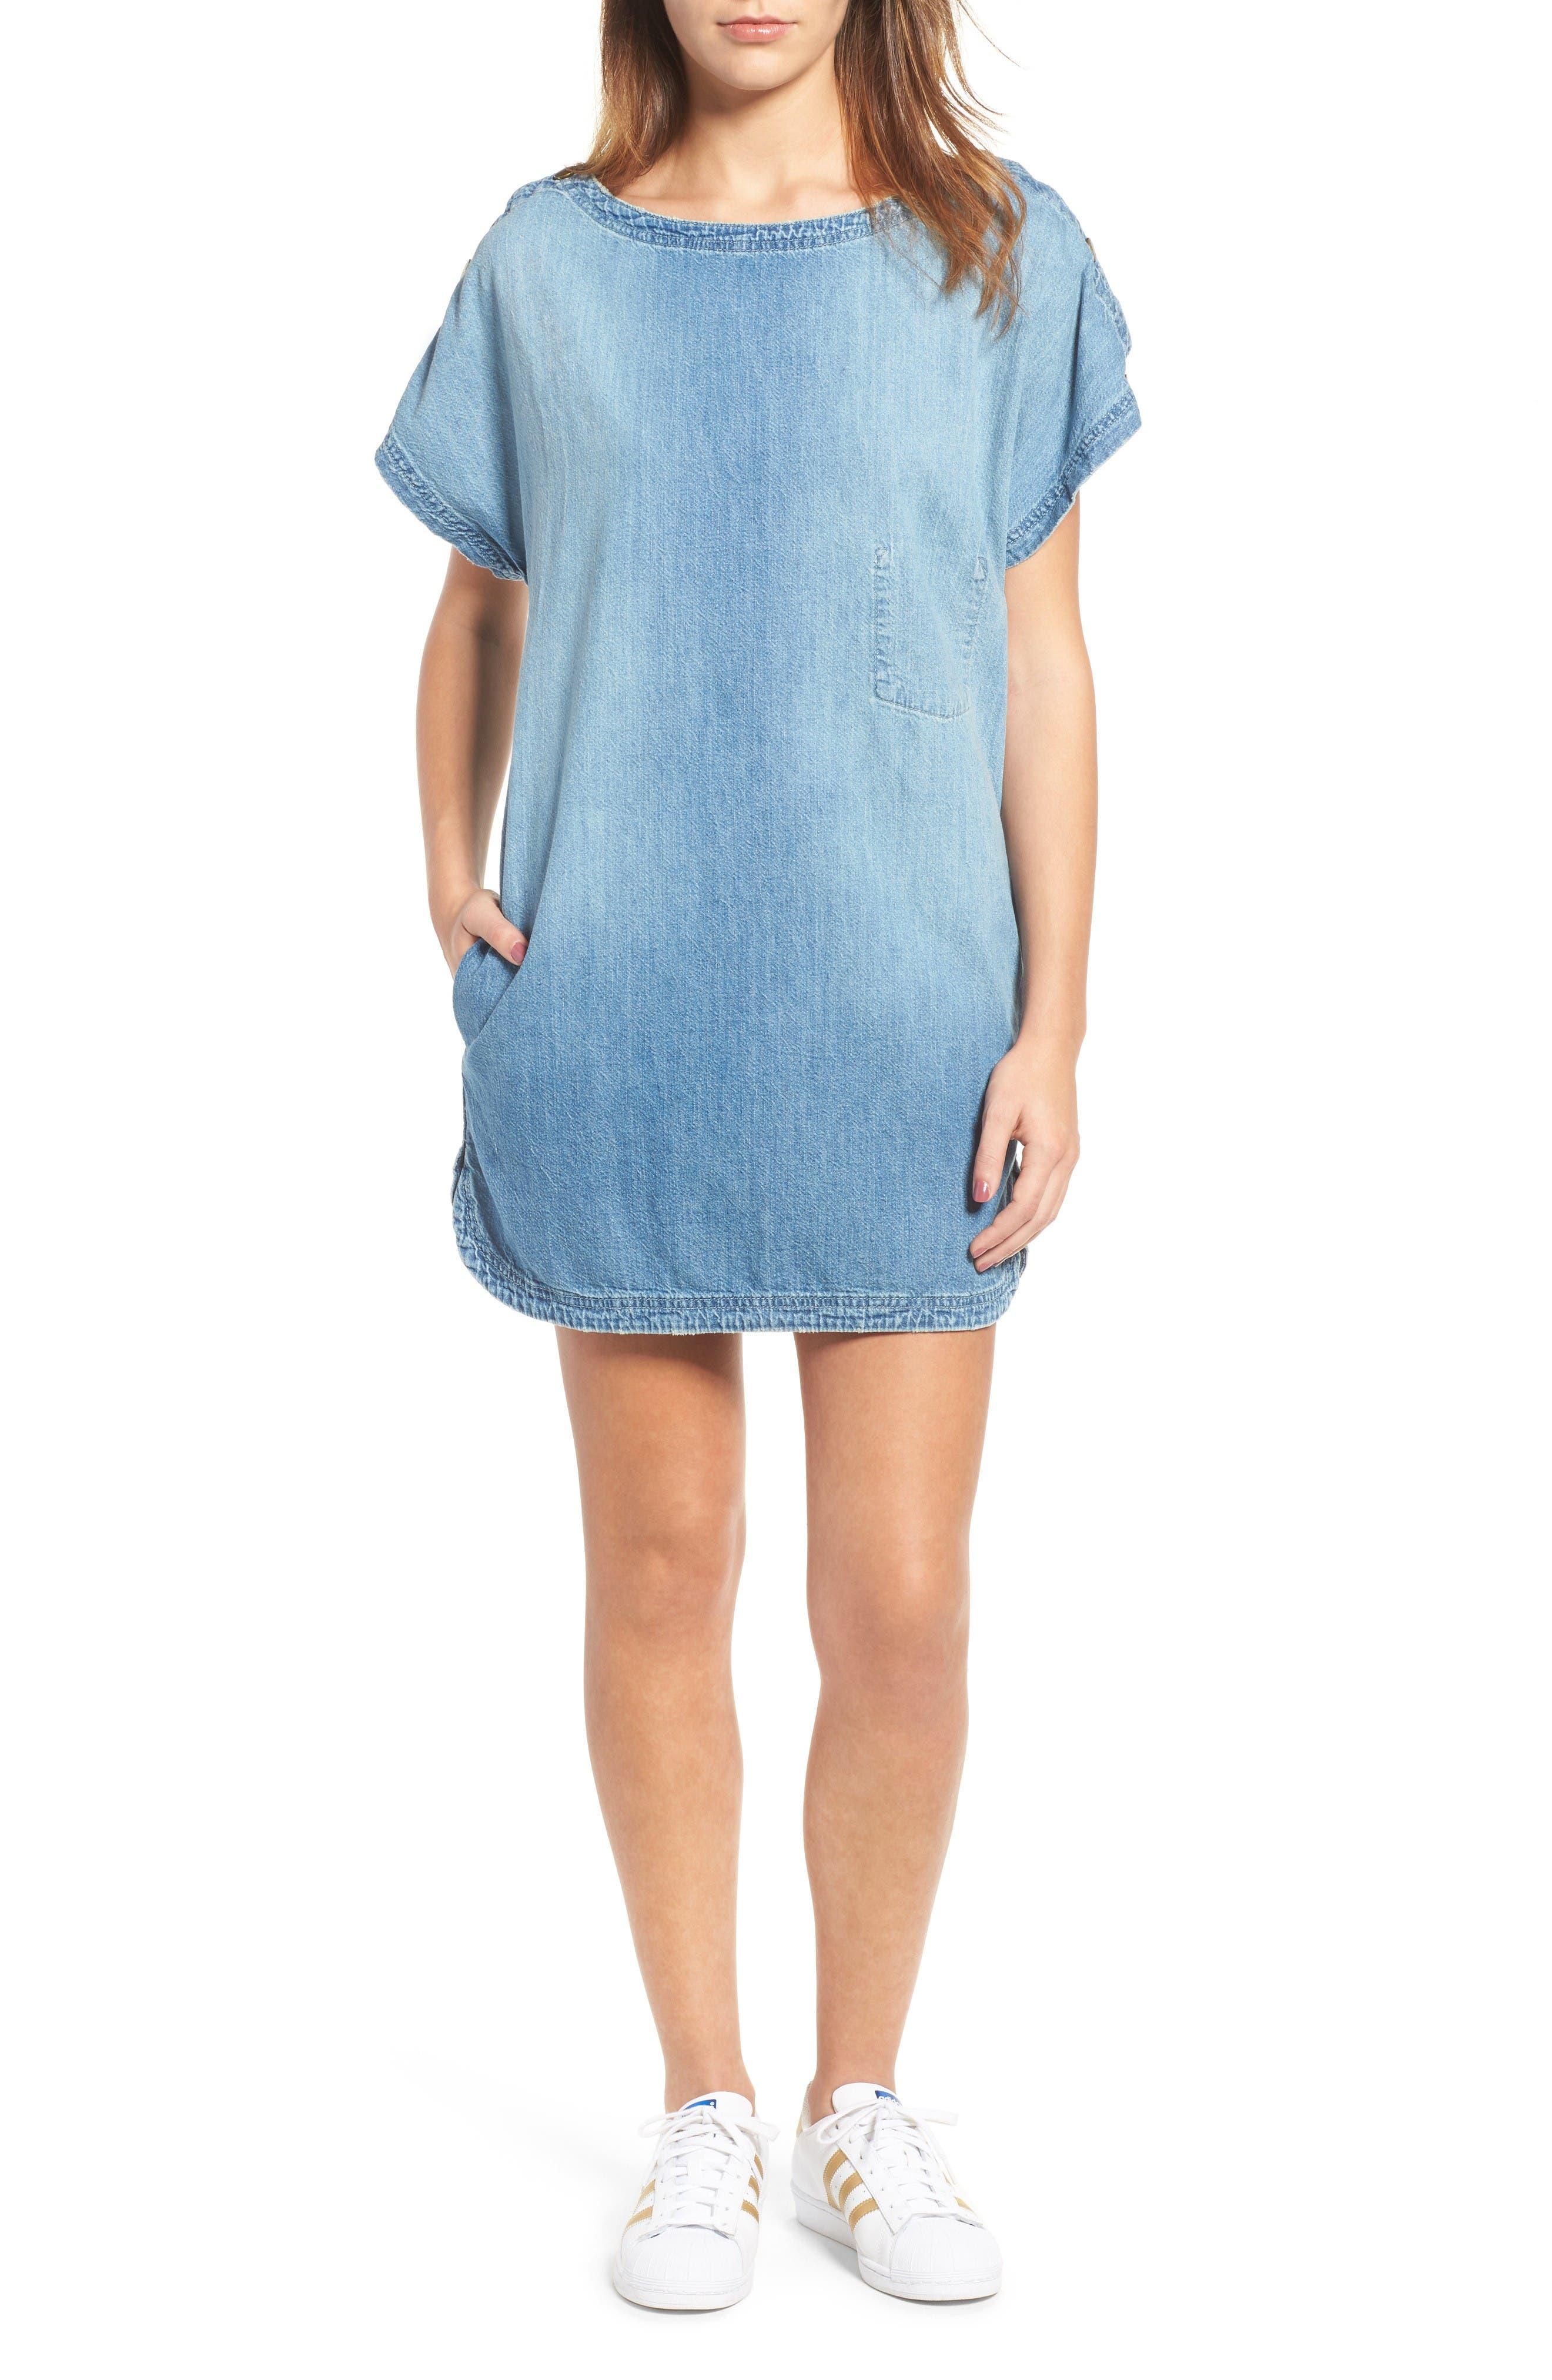 Main Image - Current/Elliott Denim T-Shirt Dress